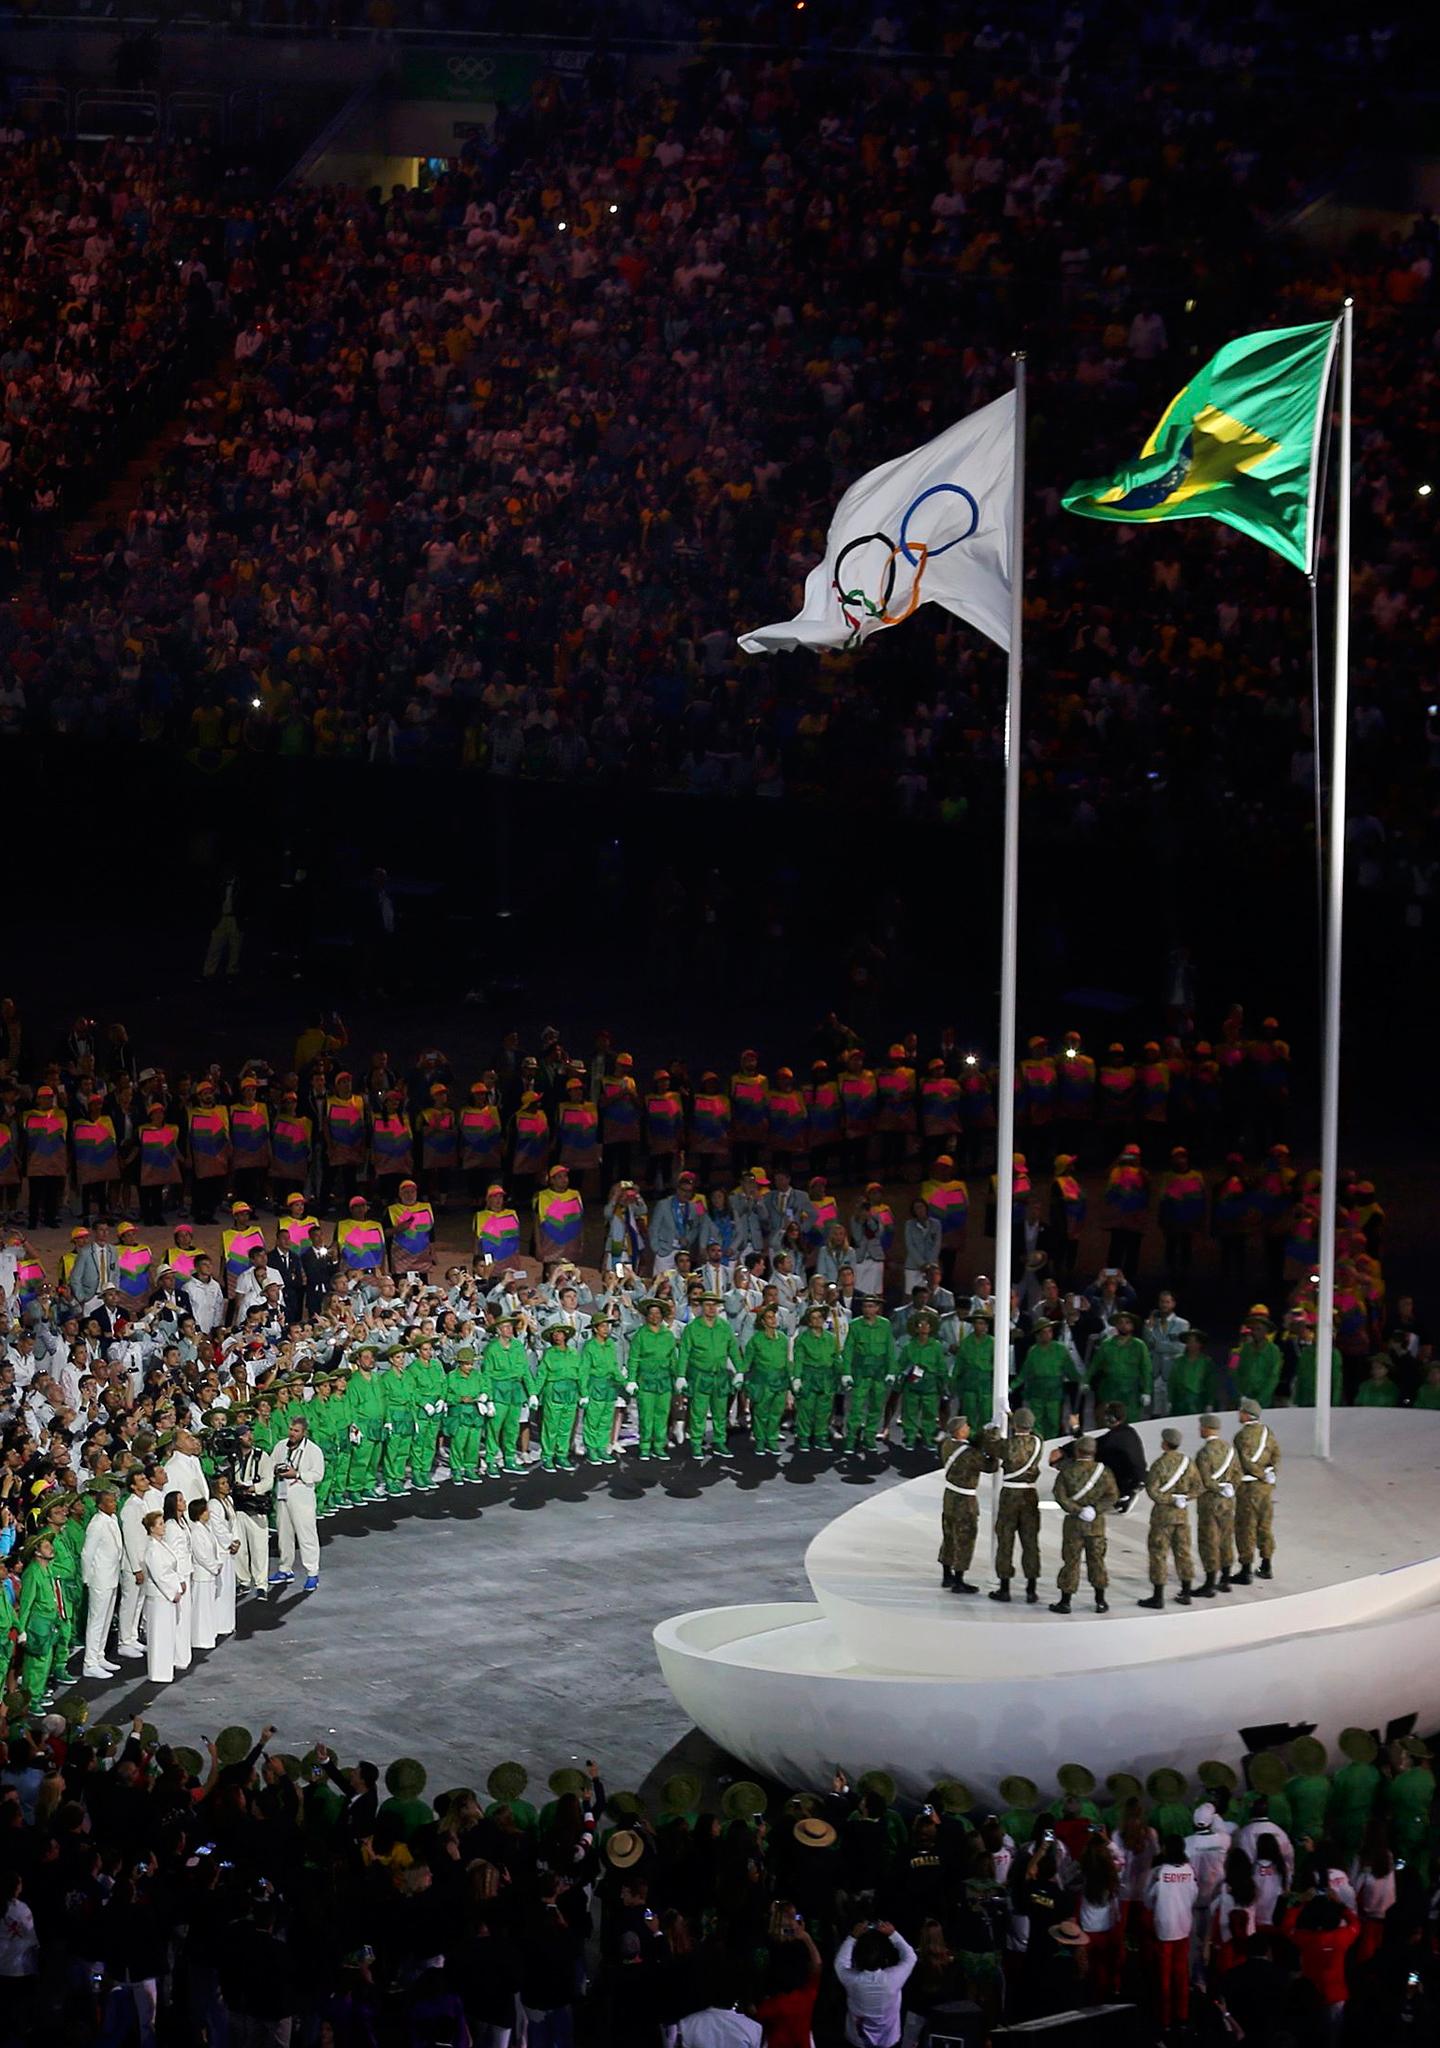 La bandera olímpica ondea en Maracaná